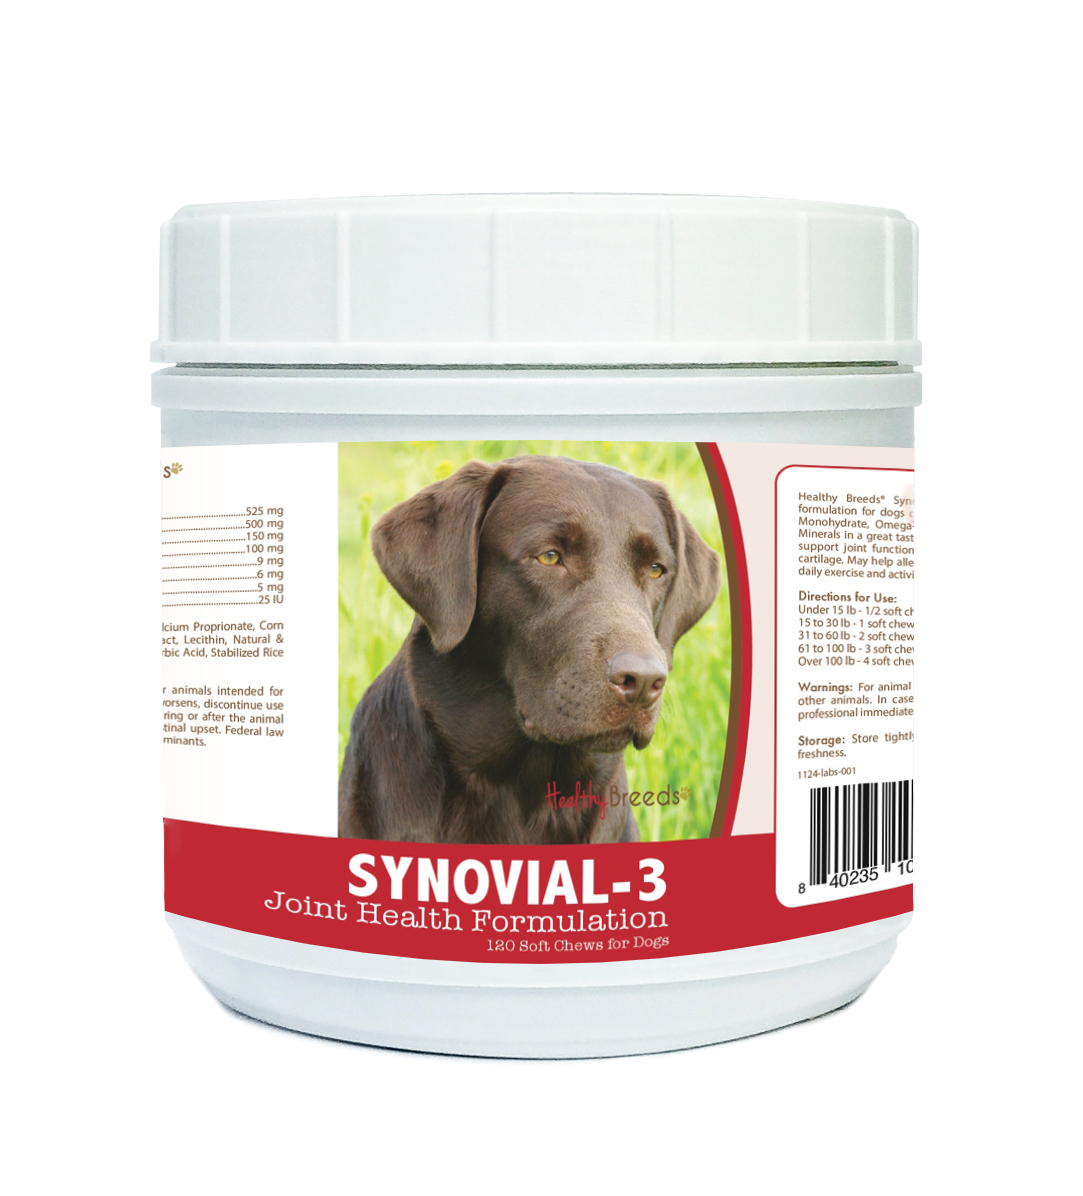 Healthy Breeds Labrador Retriever Synovial-3 Joint Health Formulation 120 Count